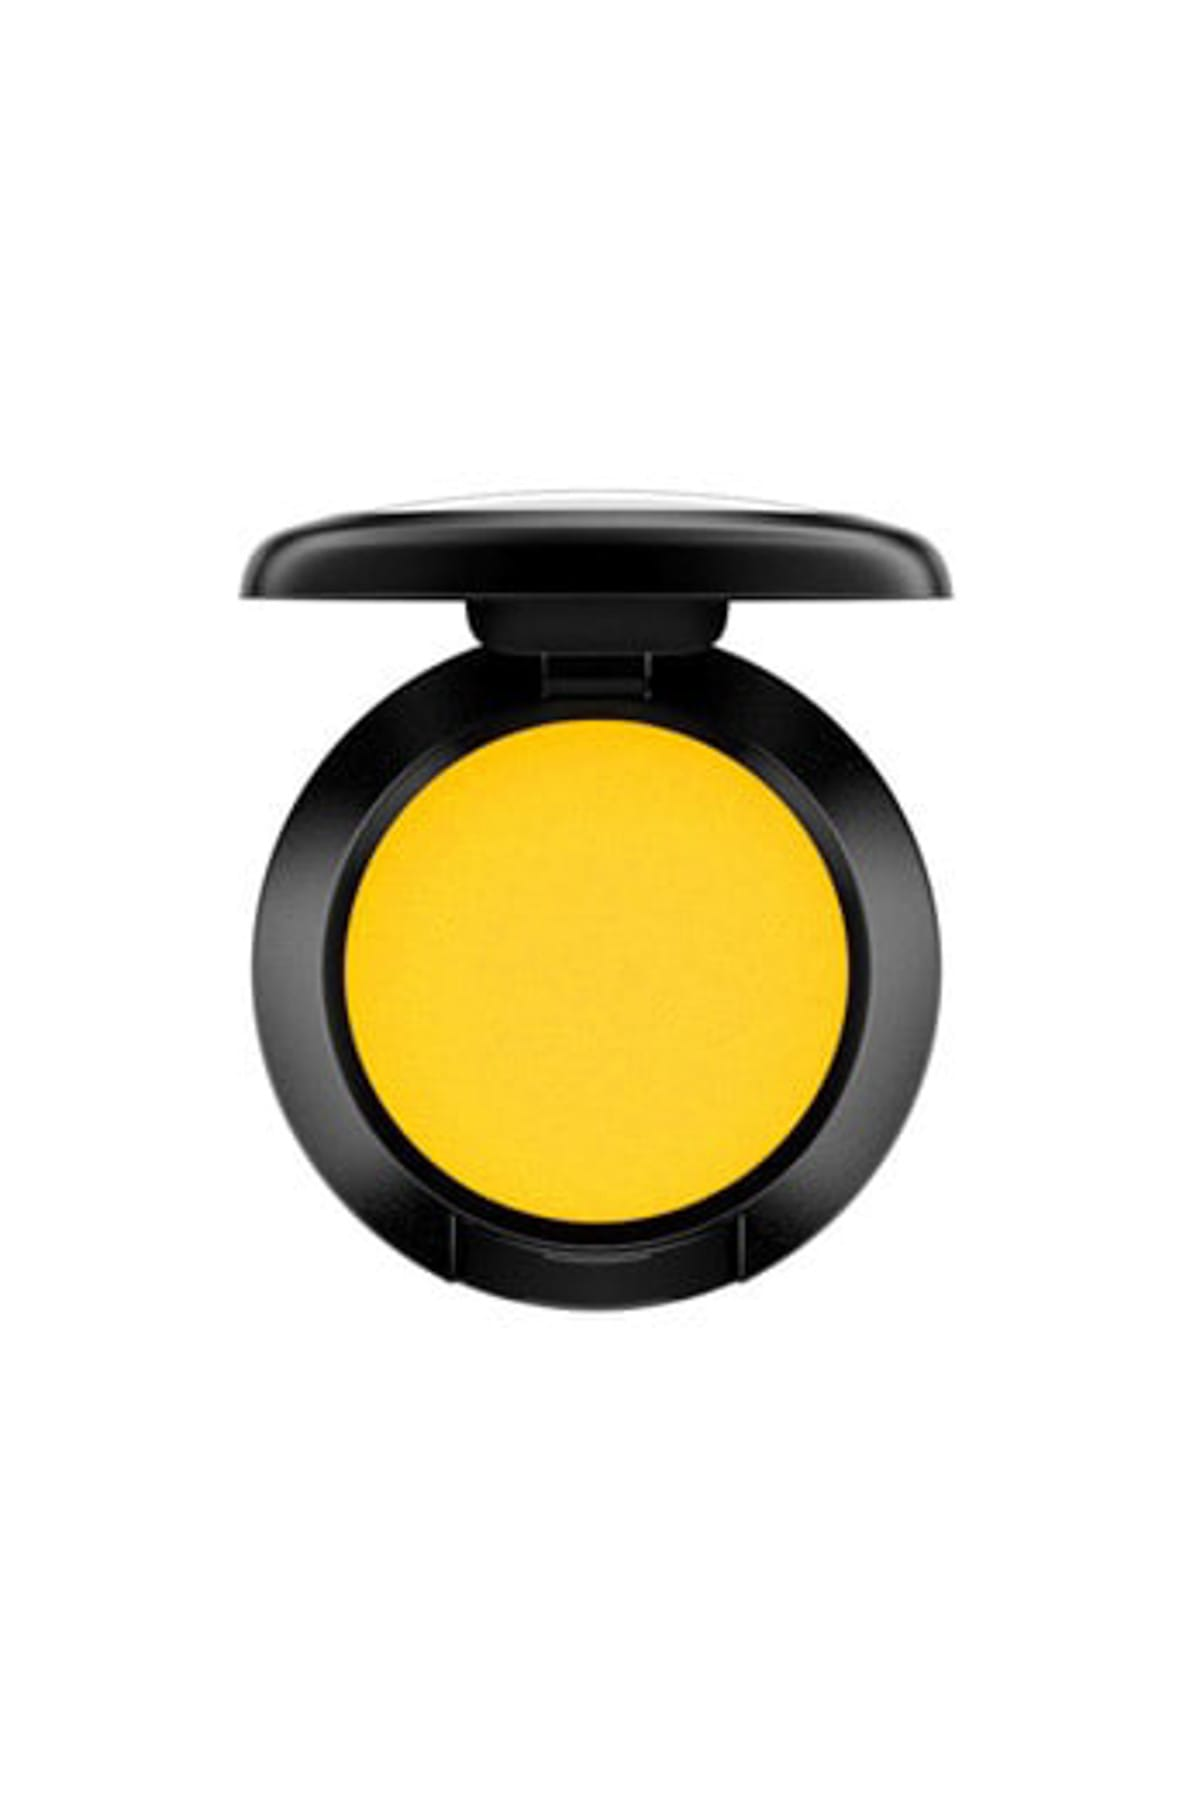 M.A.C Göz Farı - Eye Shadow Chrome Yellow 1.5 g 773602001071 1